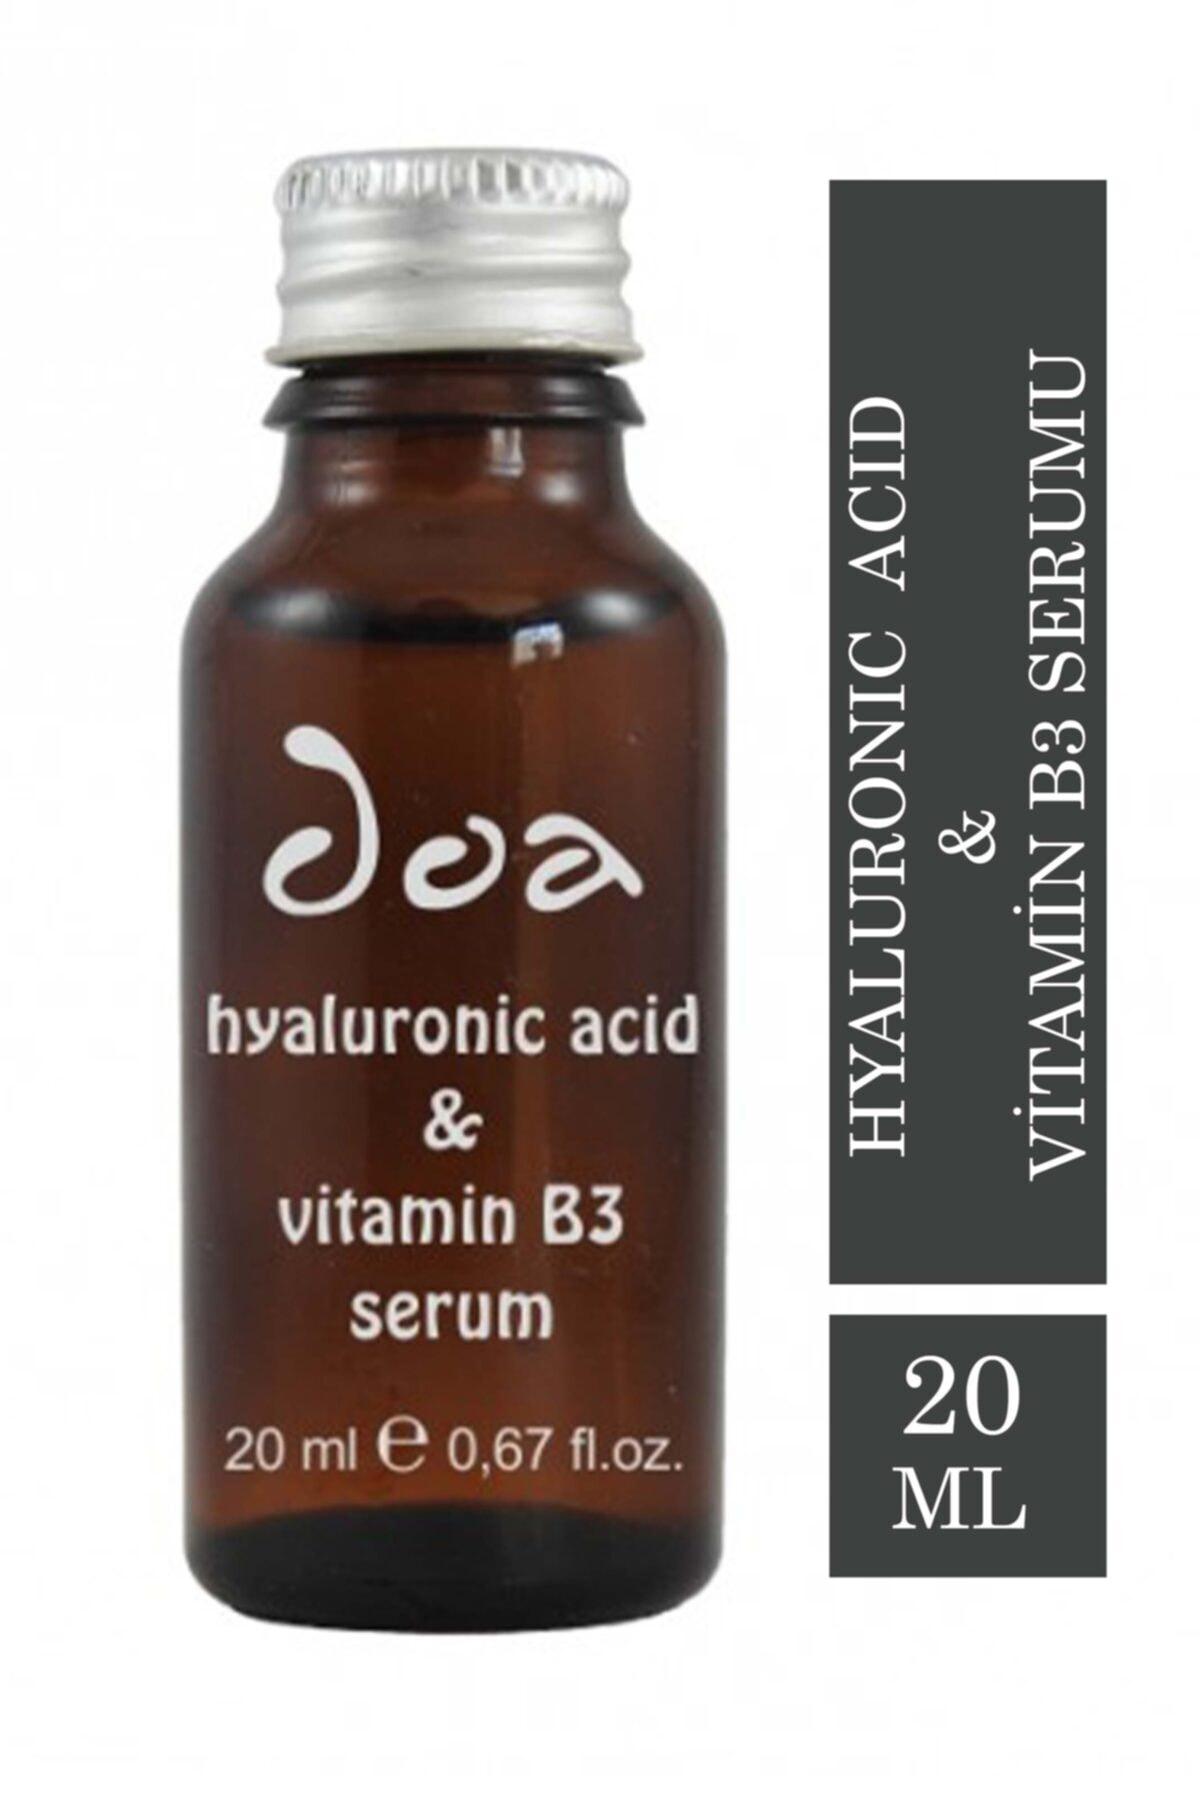 Hyaluronic Acid & Vitamin B3 Serum